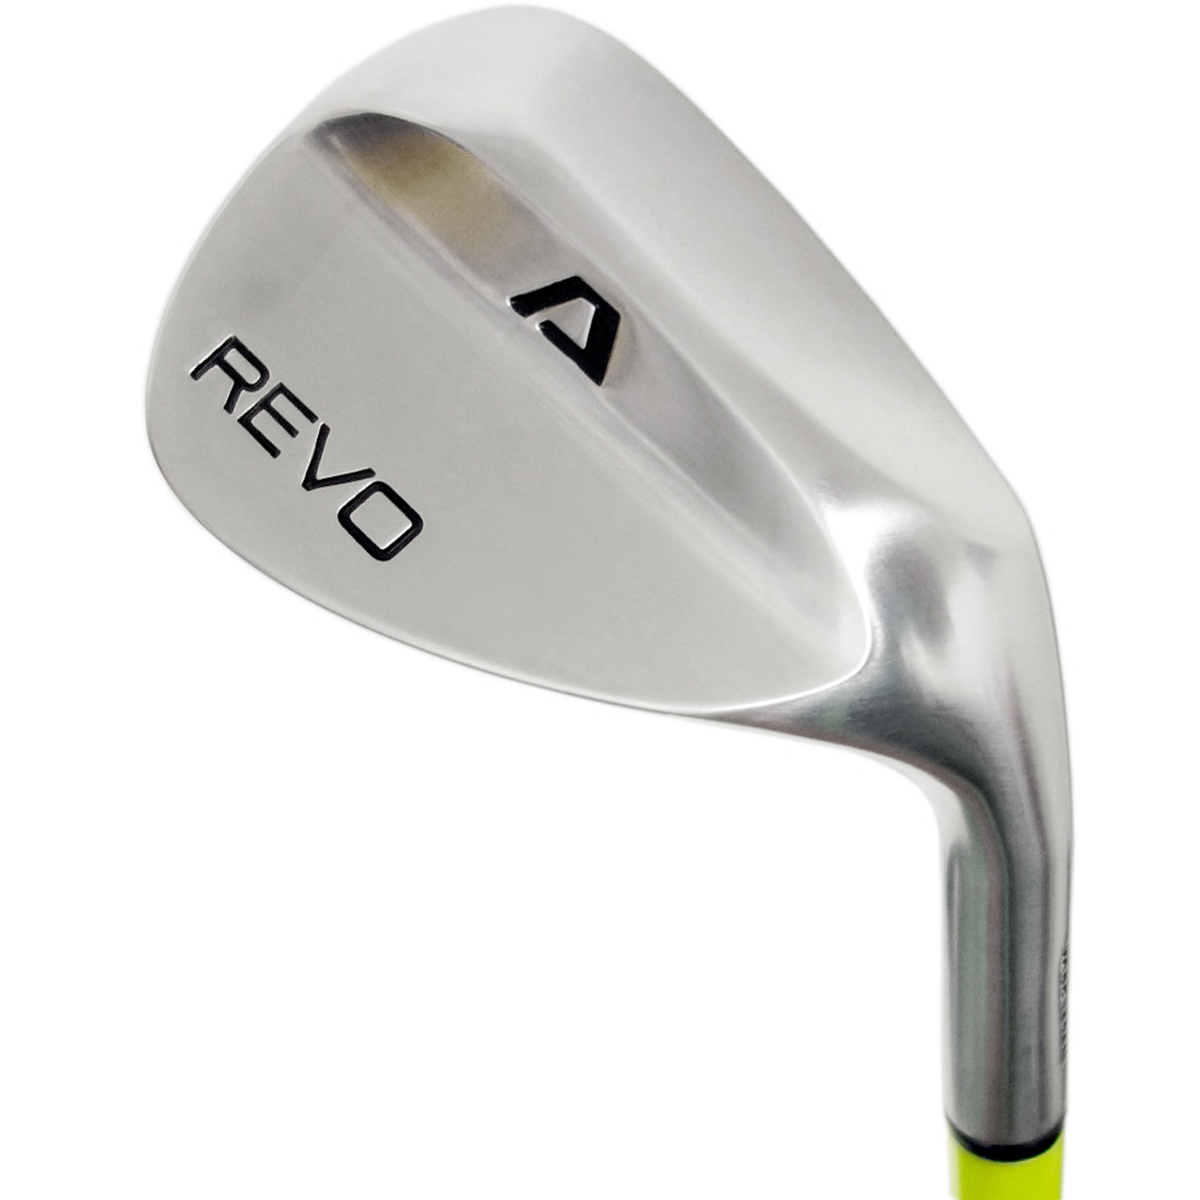 A REVO WEDGE ゴルフスイング 練習用クラブ